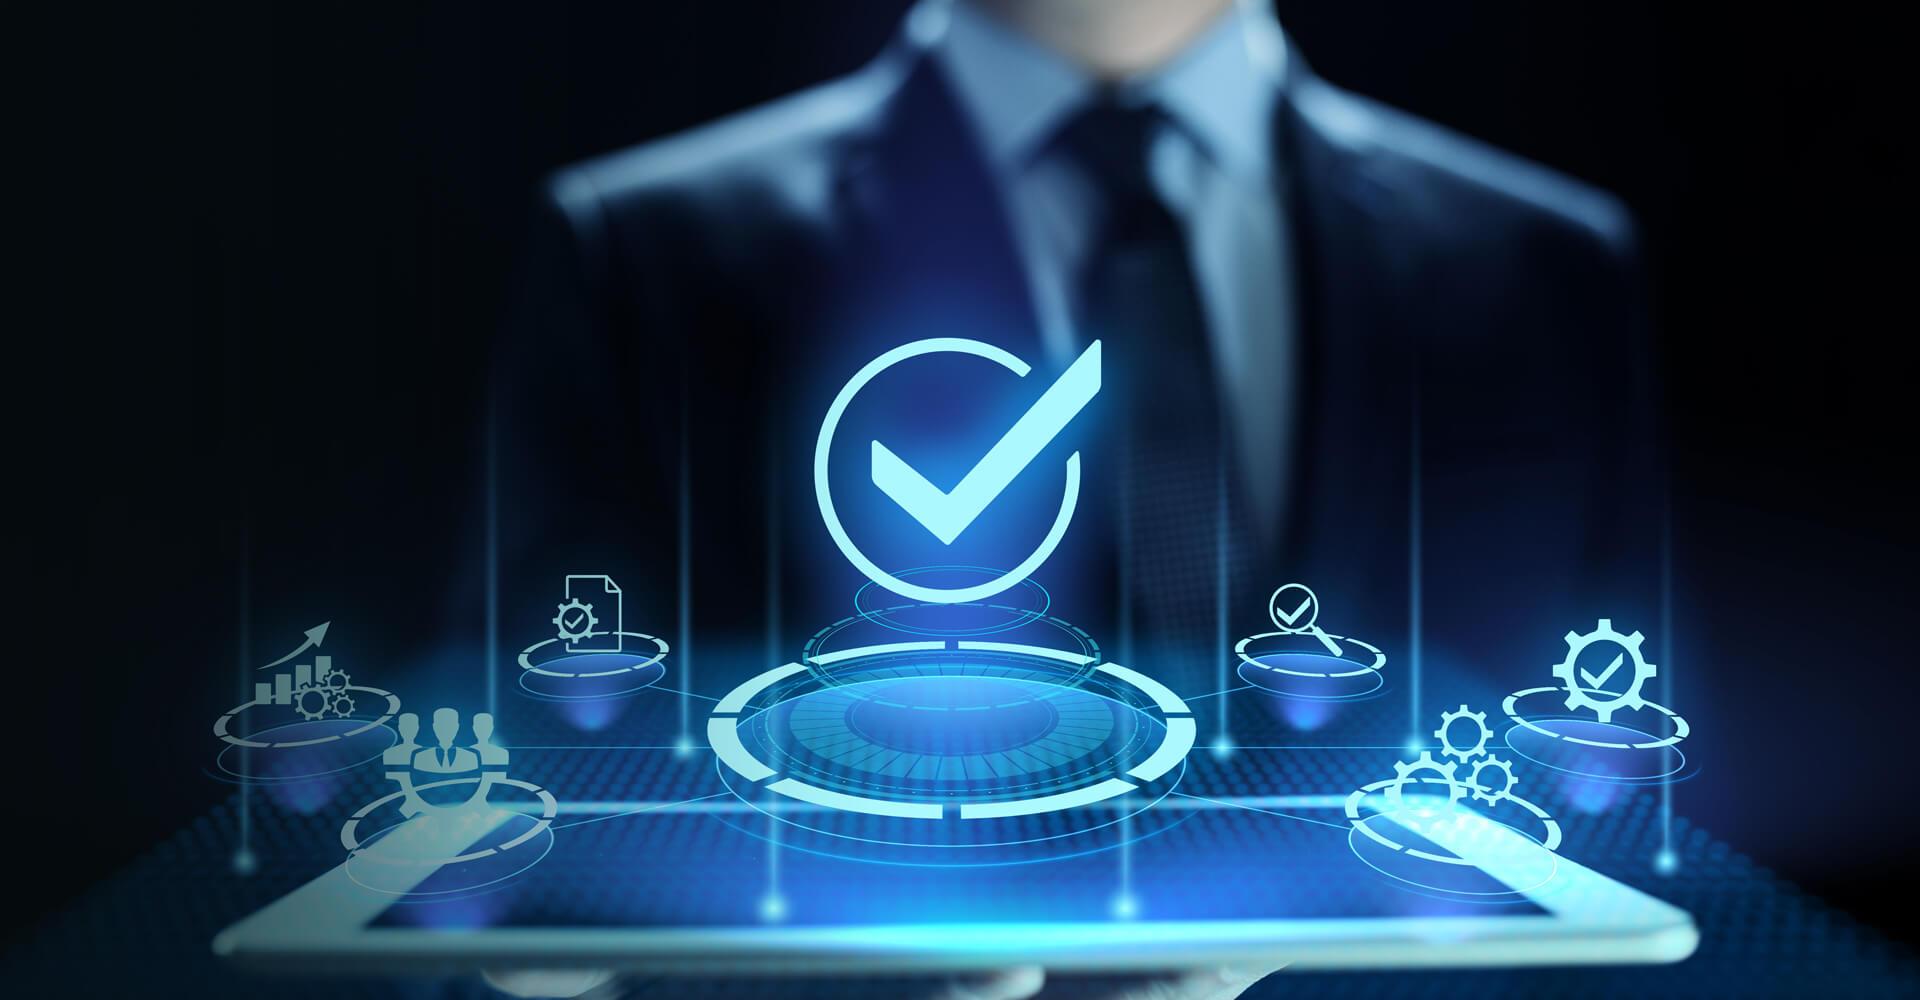 Testing and Digital Assurance Services | Digital Assurance Solutions